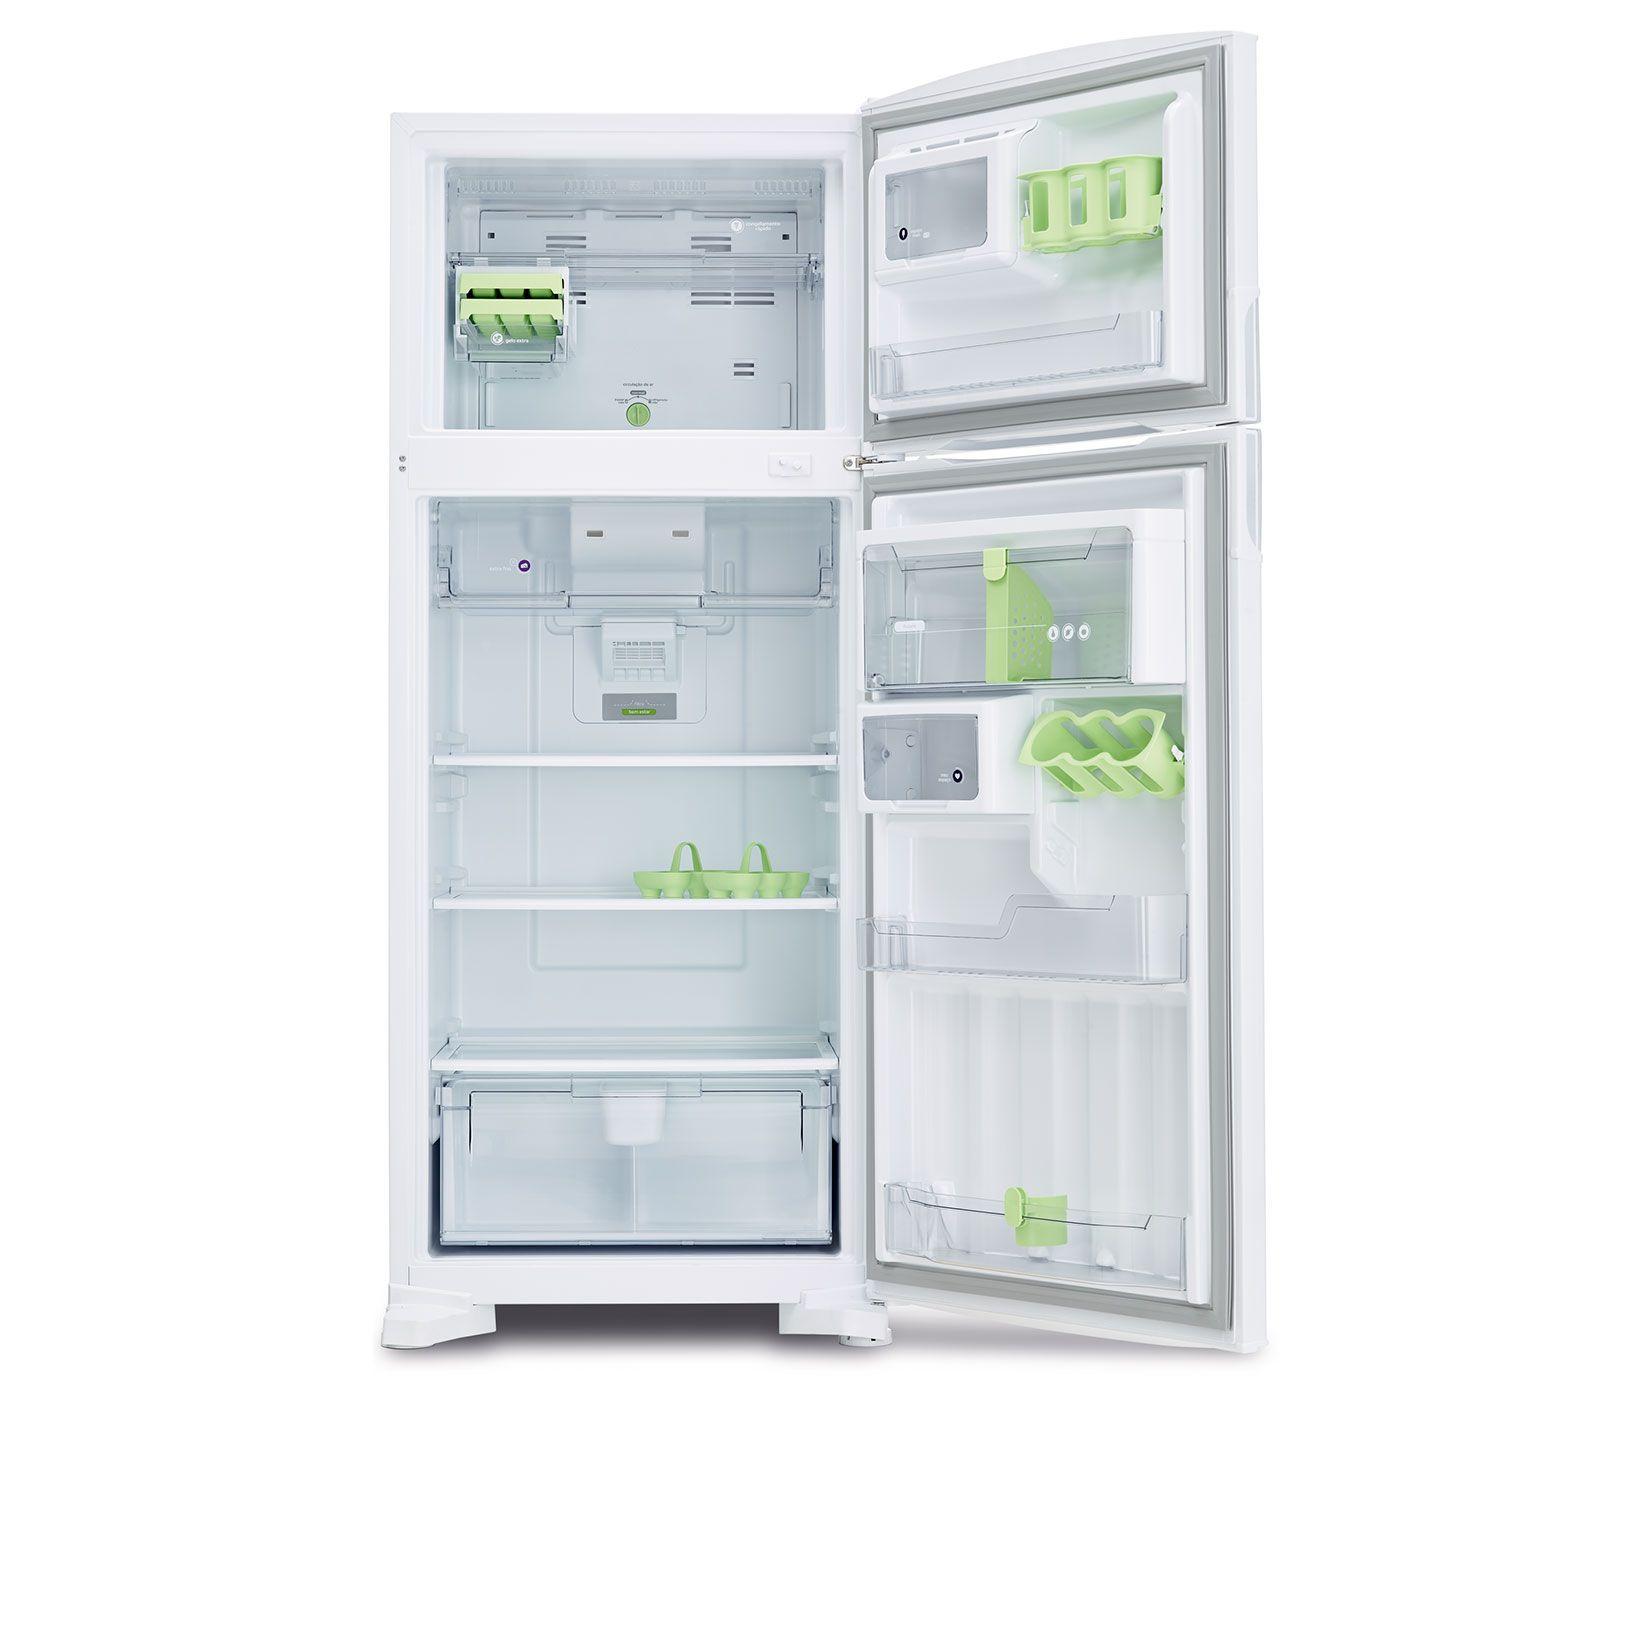 4eb7094e0 Geladeira Consul Frost Free Duplex 405 litros Branca